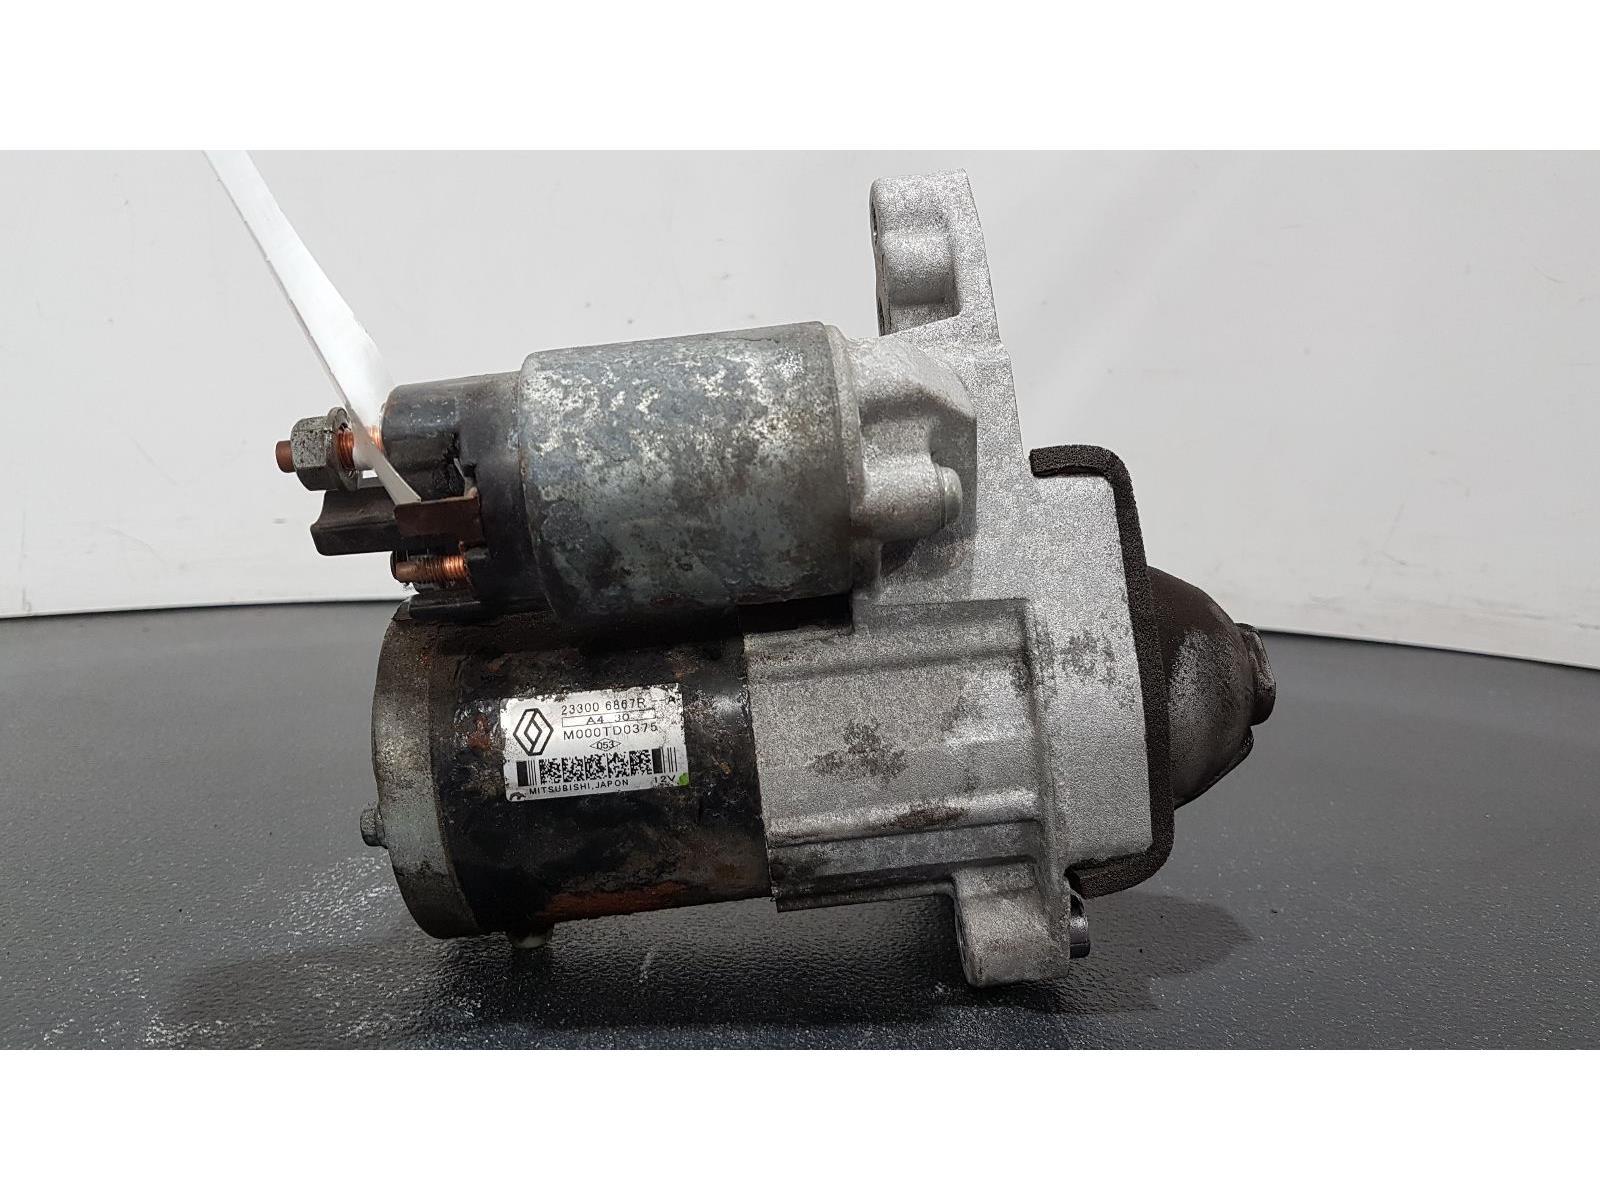 Nissan Qashqai 2013 To 2017 1.2 Petrol Starter Motor 233006867R